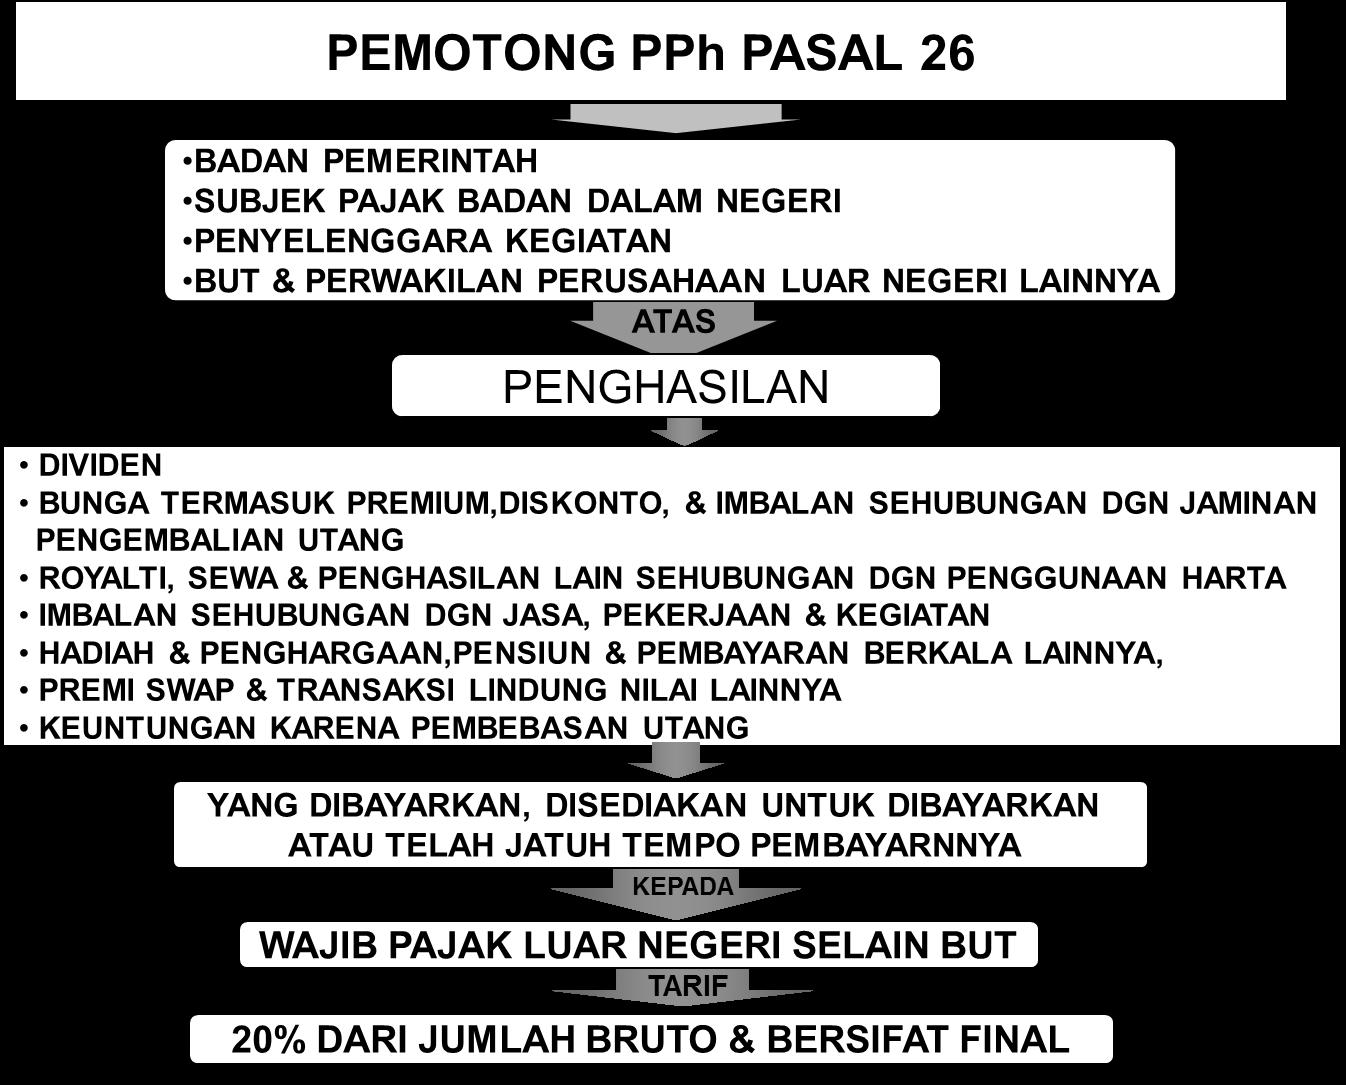 download espt pph badan 2011